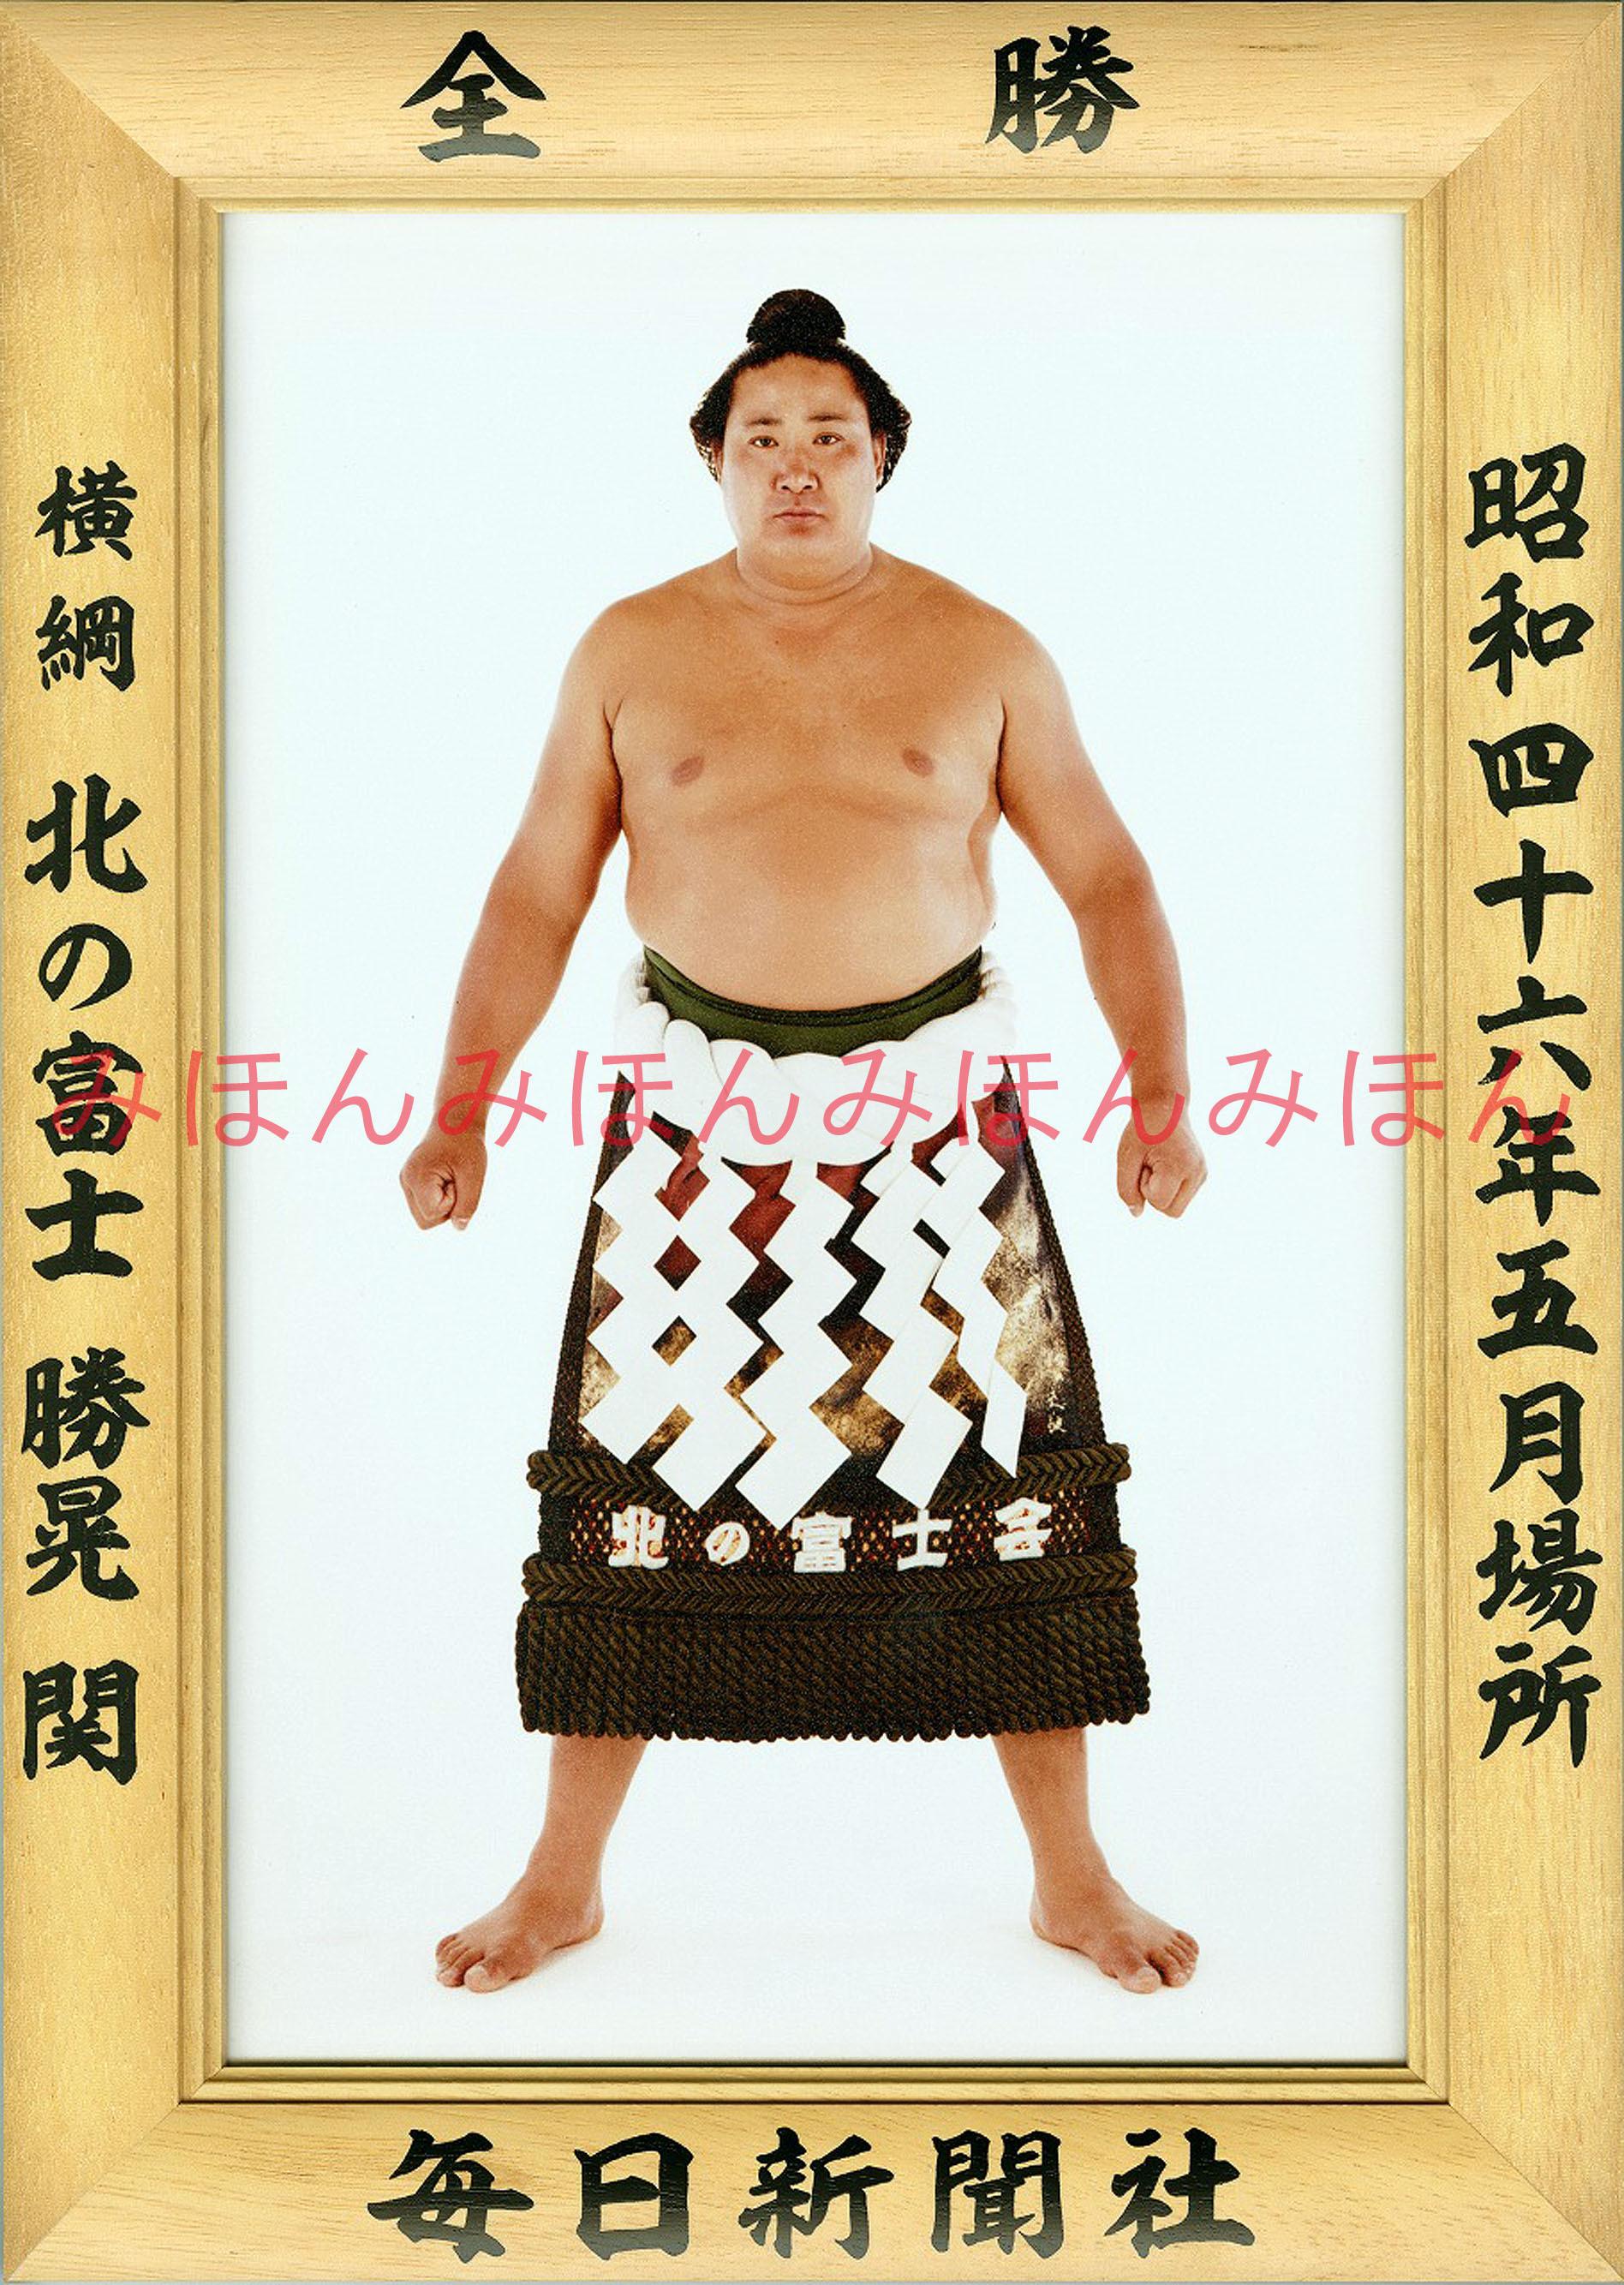 昭和46年5月場所全勝 横綱 北の富士勝晃関(6回目の優勝)